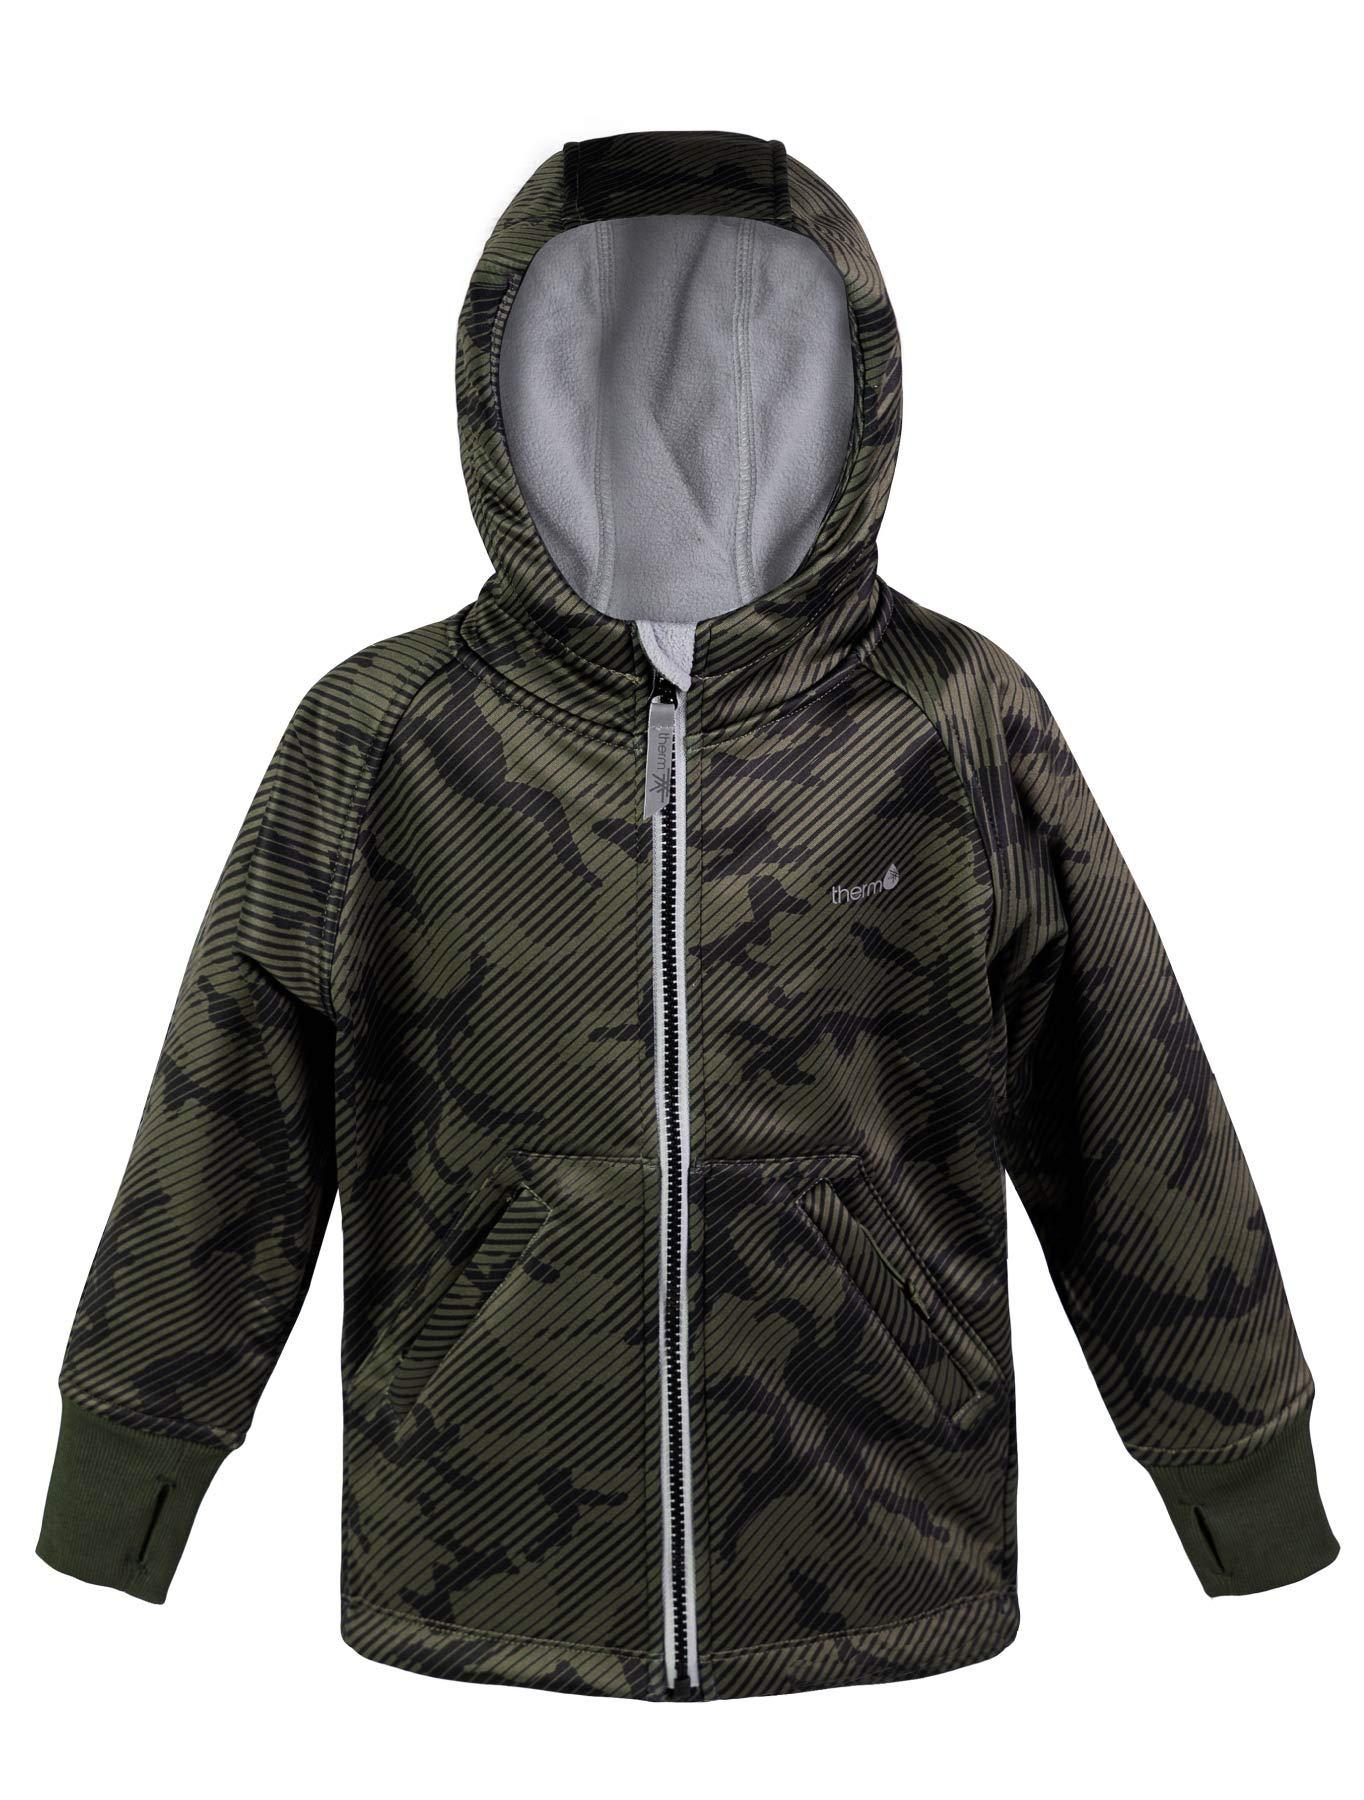 Therm Boys Rain Jacket, Lightweight Hoodie Raincoat - Eco Friendly Fabric, Fleece Lined - Camo Black Navy - Kids Youth (12, CAMO) by Therm